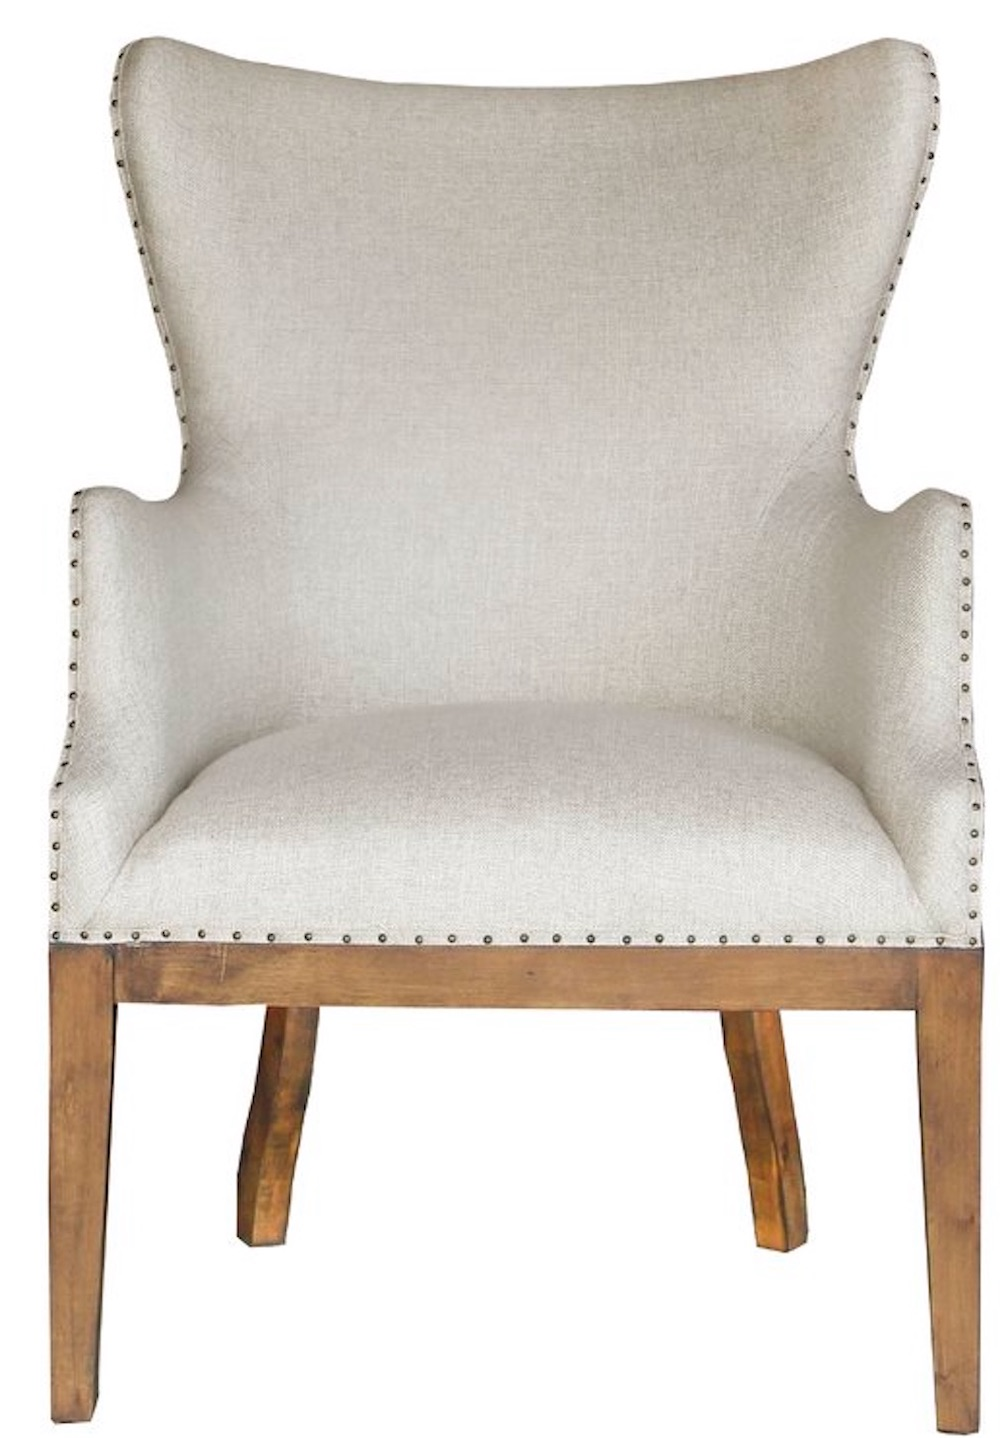 Chairs for Neutral Decors Mose Armchair #Chairs #AccentChairs #Decor #VintageDecor #FarmhouseDecor #NeutralDecor #Furniture